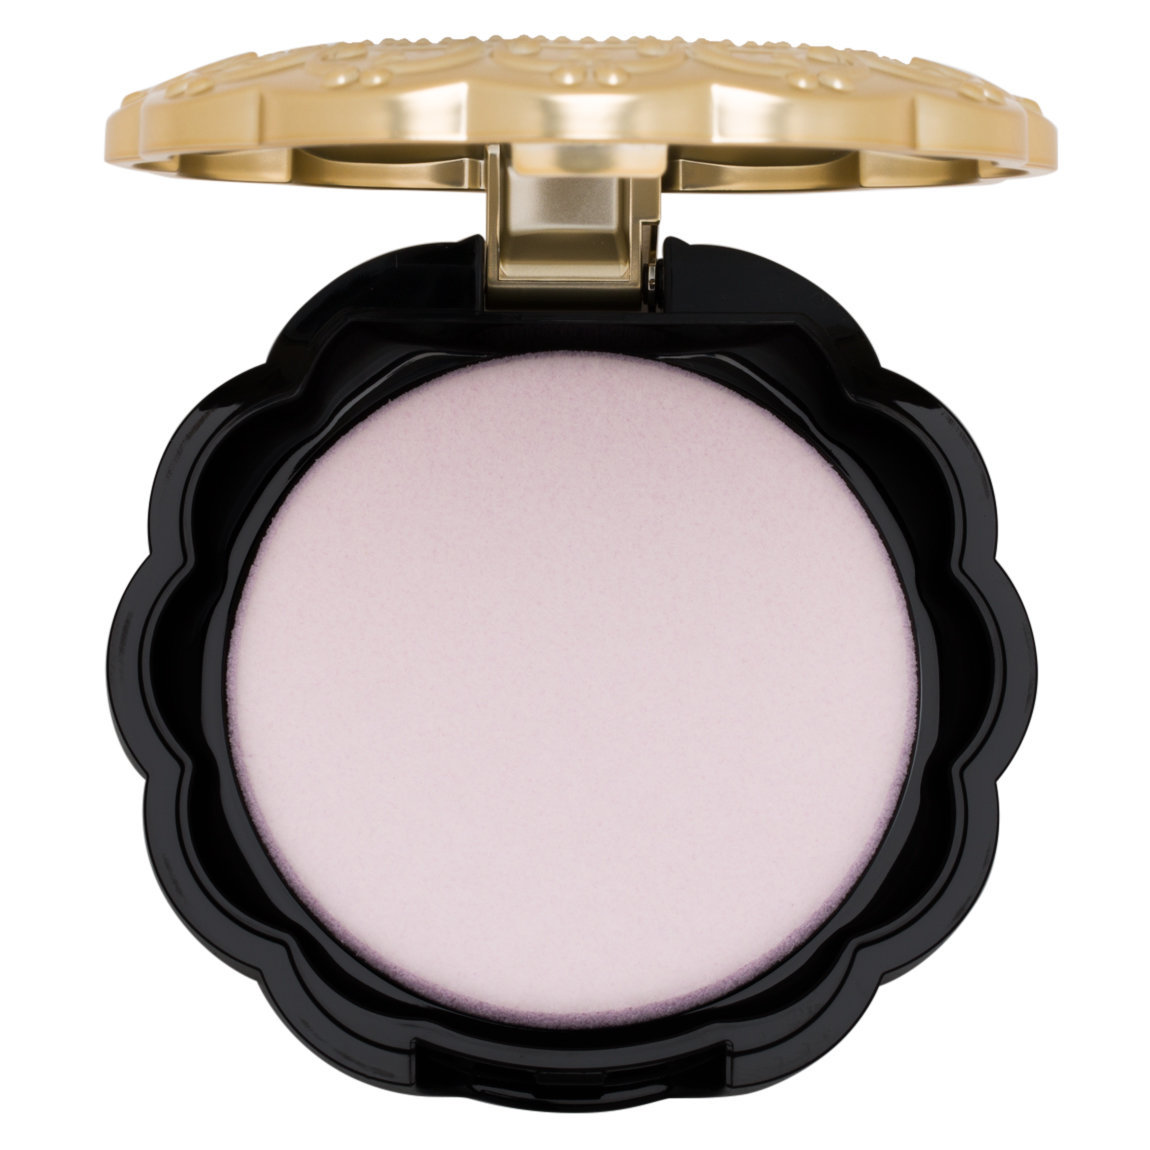 Anna Sui Makeup Compact Case 2